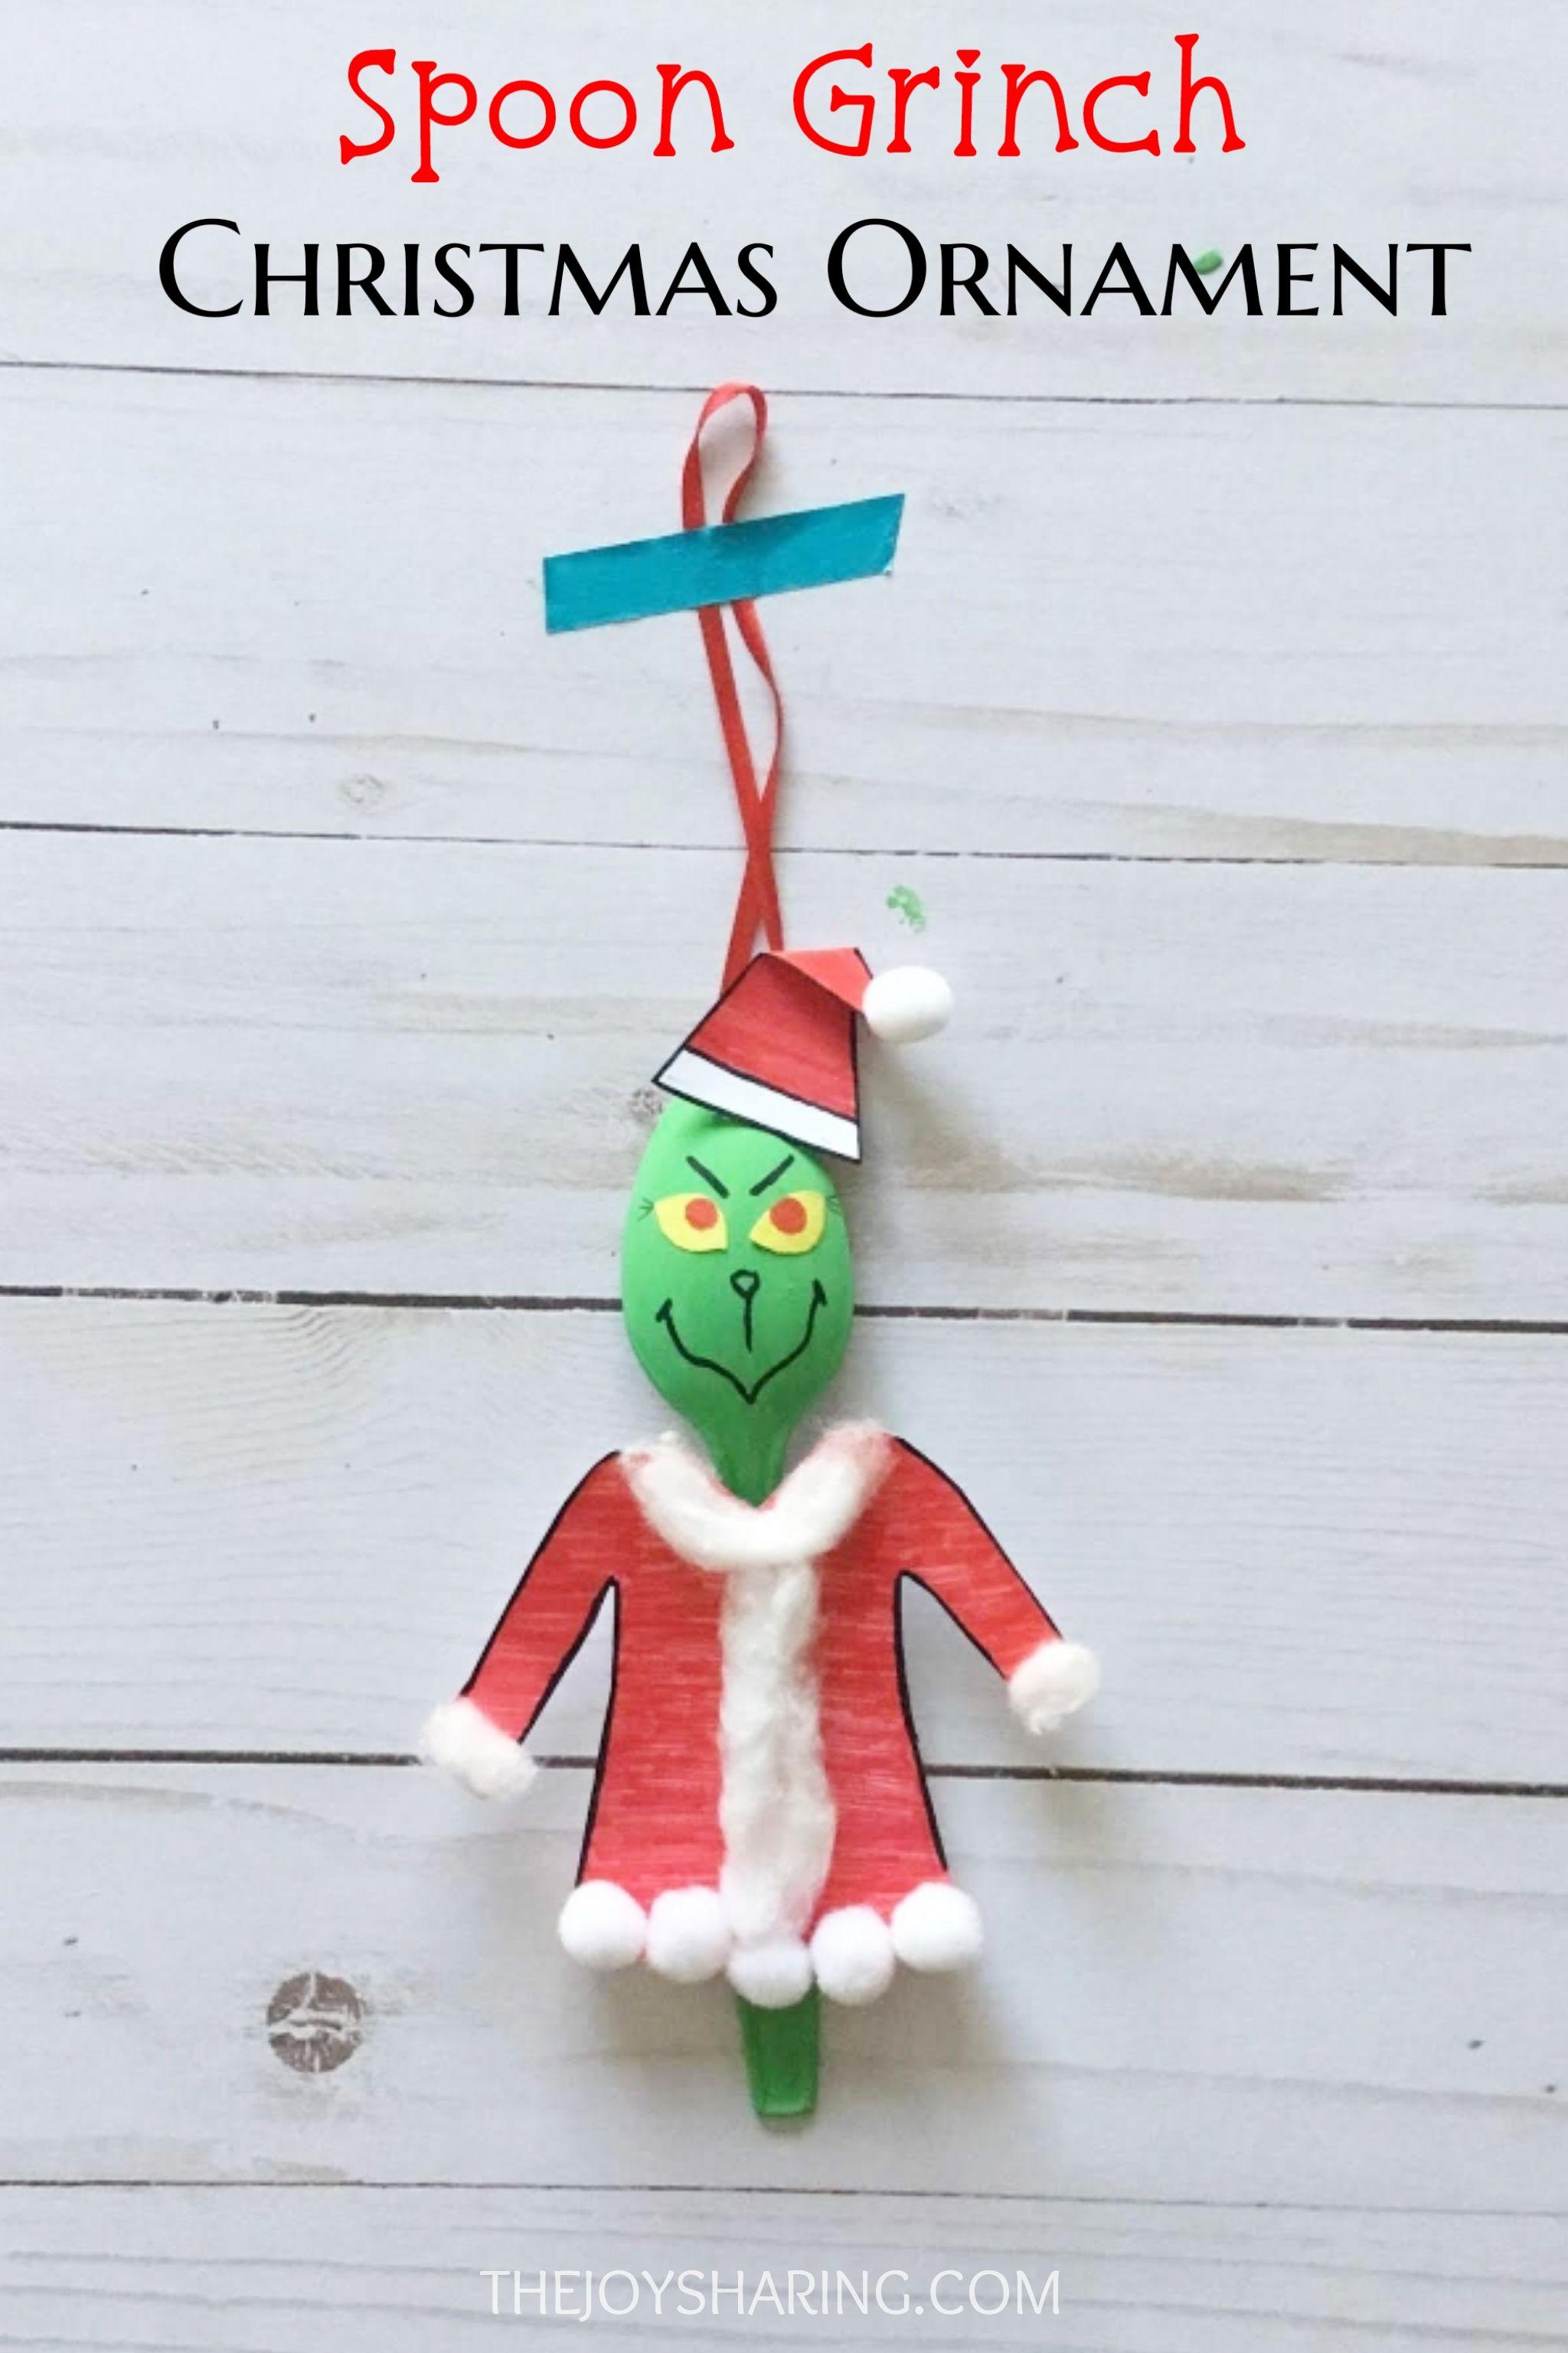 Spoon Grinch Christmas Ornament